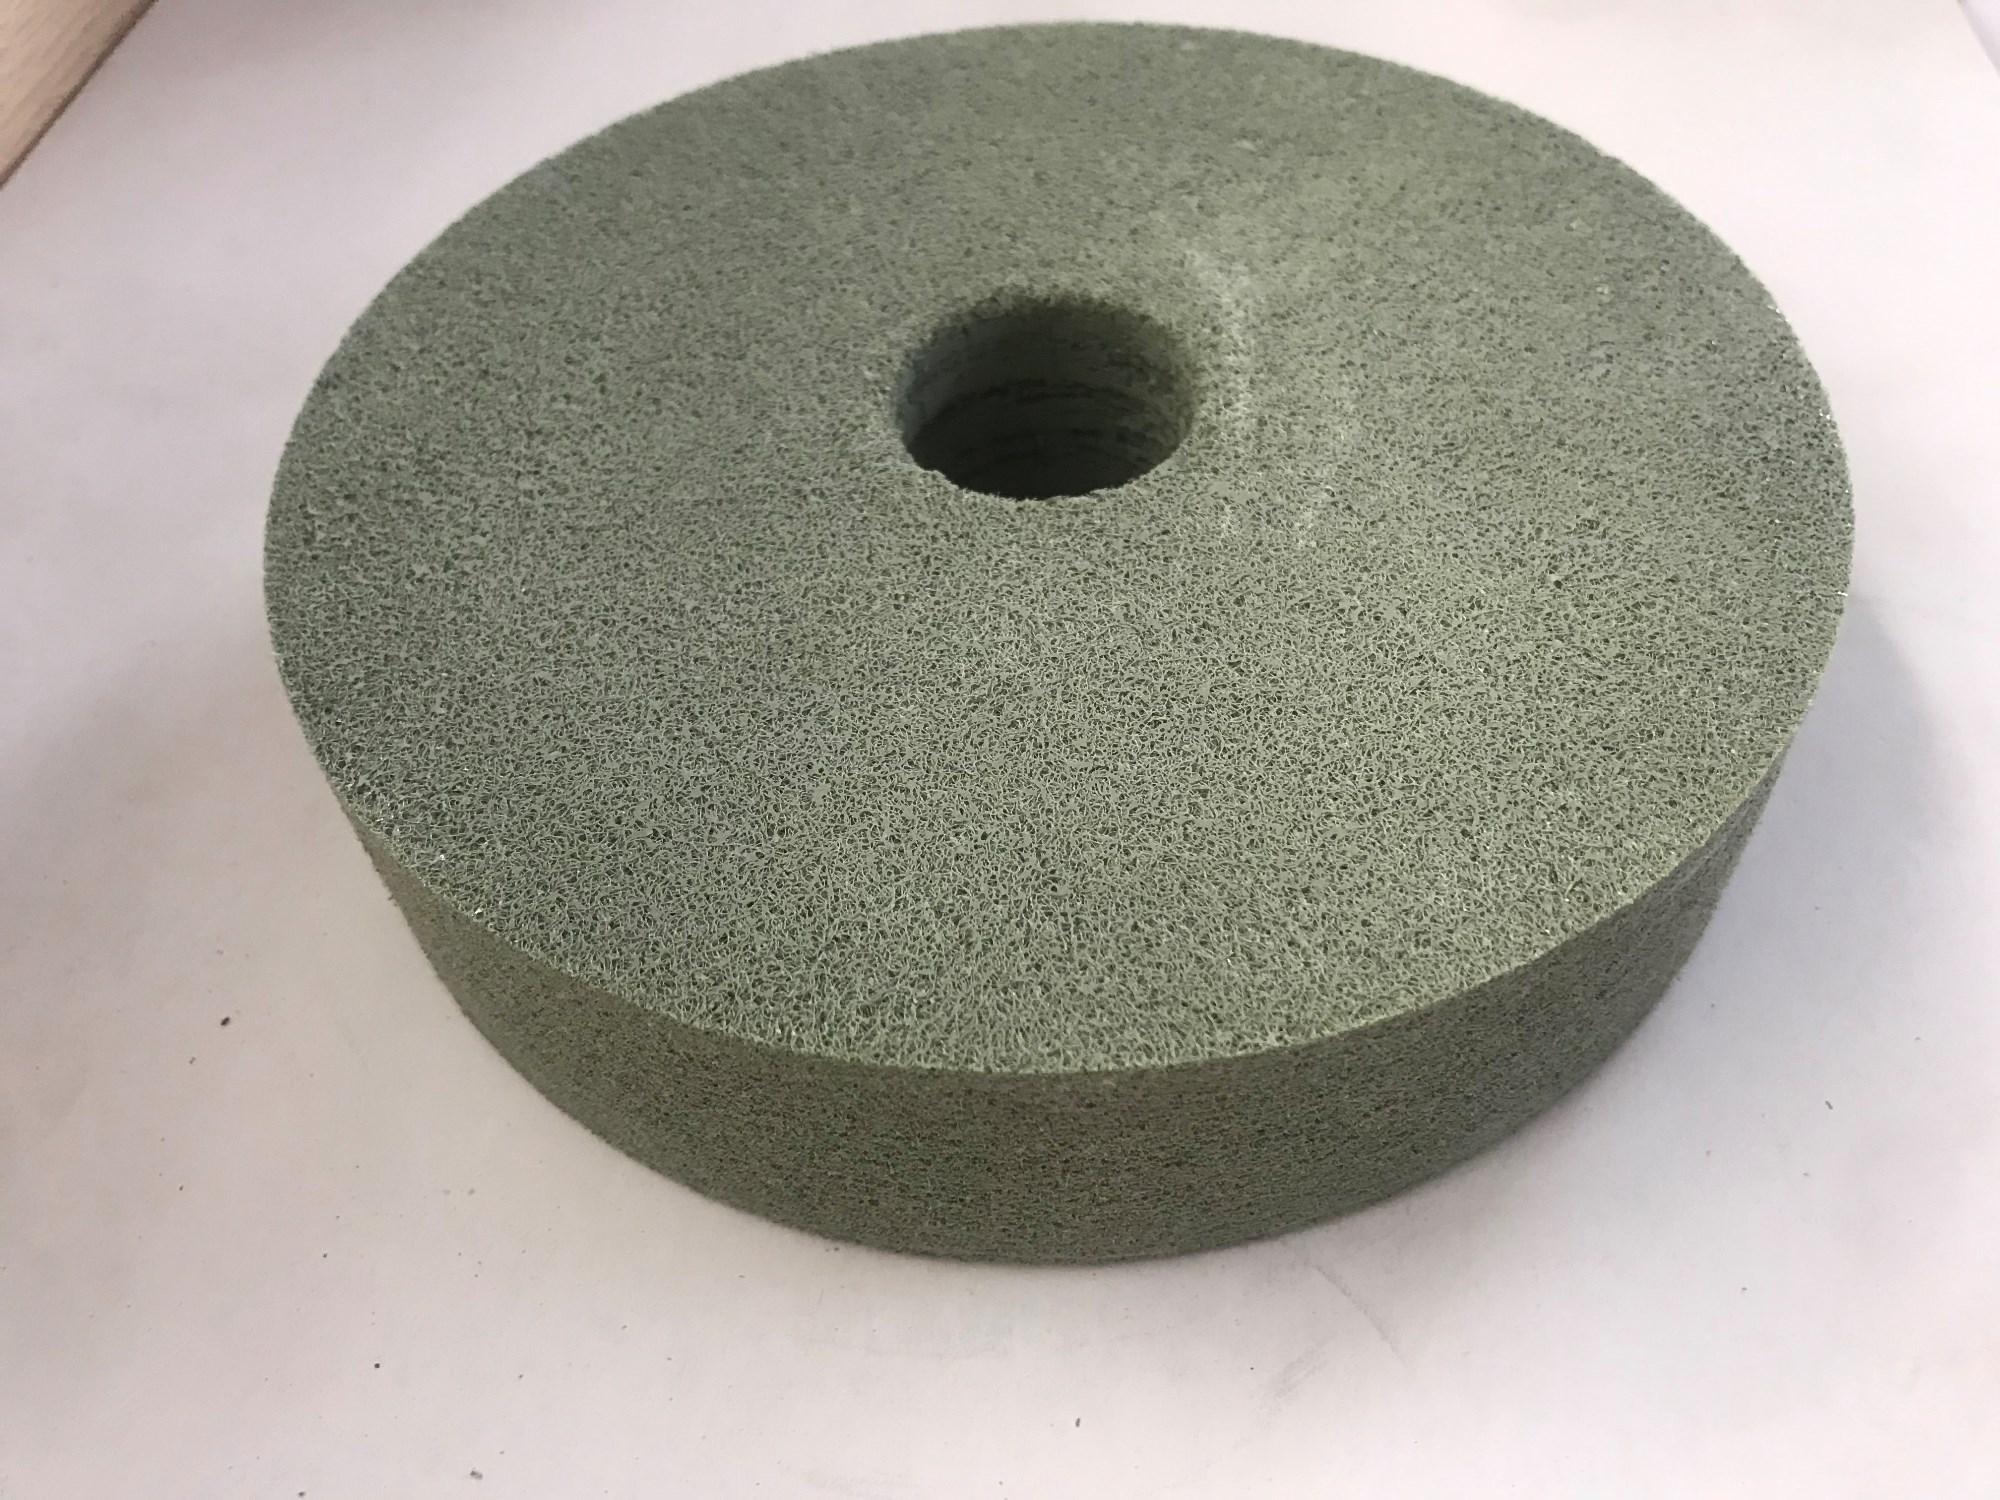 T.25mm Sponge Wheel Manufacturers, T.25mm Sponge Wheel Factory, Supply T.25mm Sponge Wheel